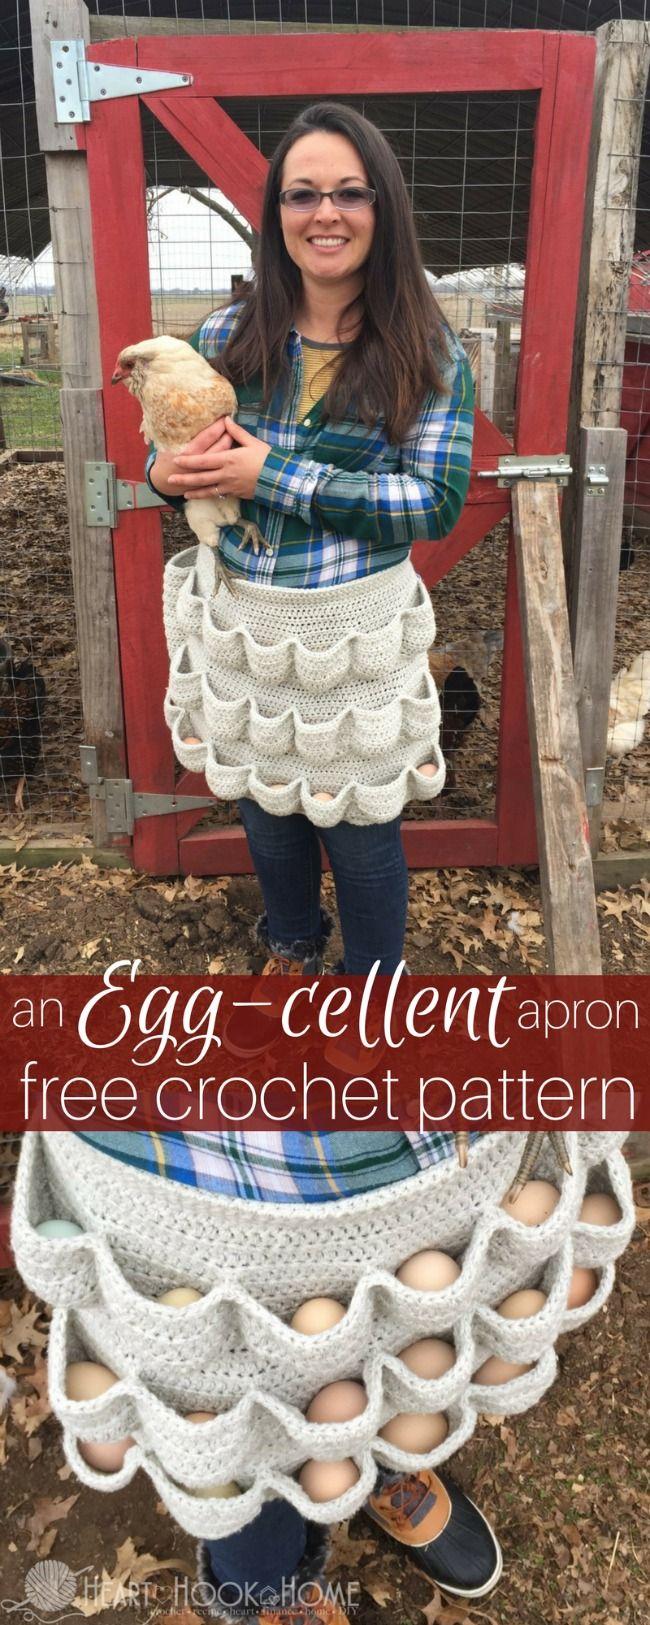 An Egg-cellent Apron Free Crochet Pattern #crocheting #crochetpattern #freepattern #eggapron